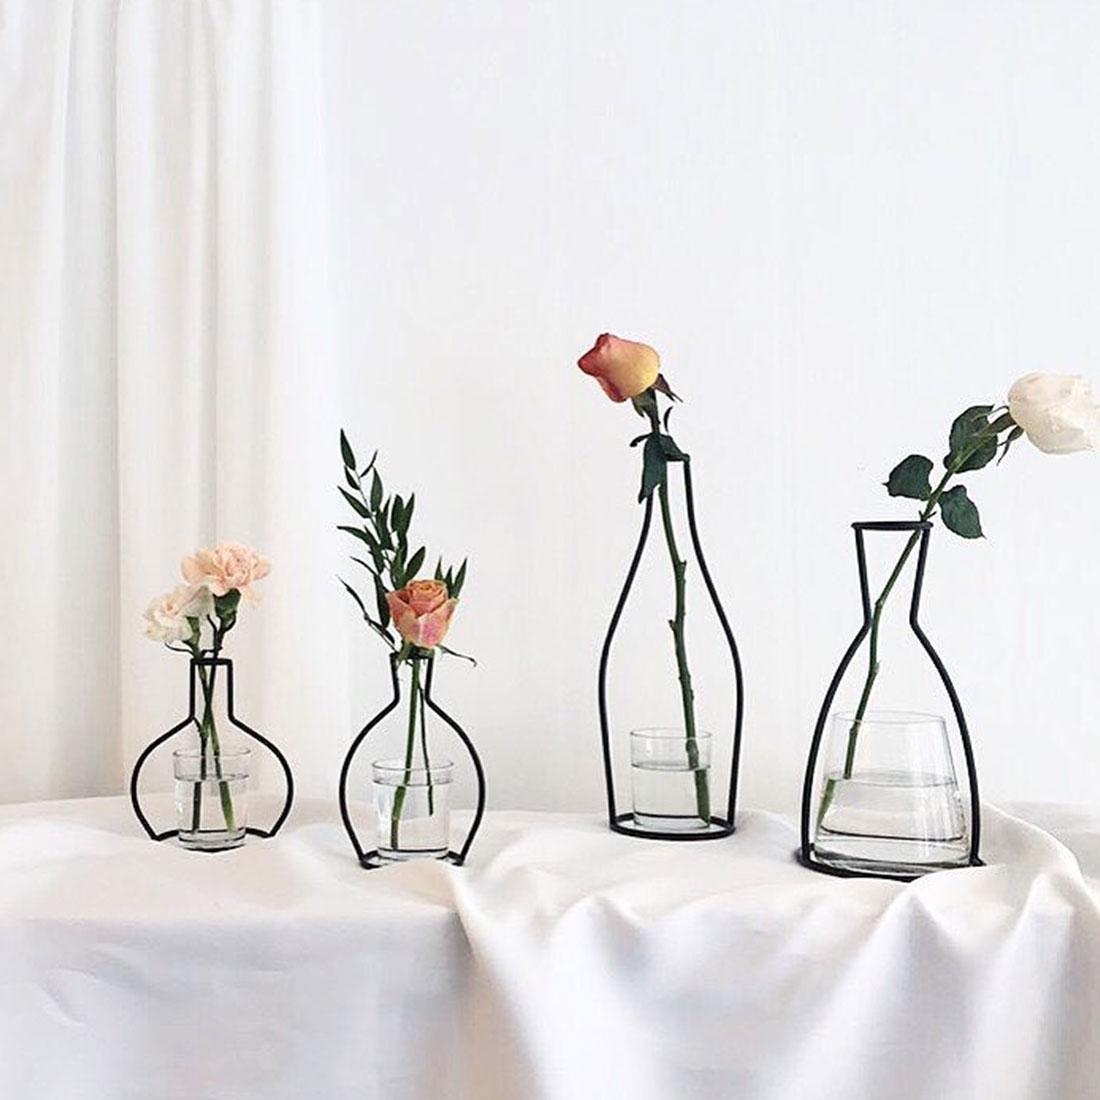 Zerama Abstract Black Lines Minimalist Iron Vase Dried Flower Tabletop Pots Shelf Home Office Decoration